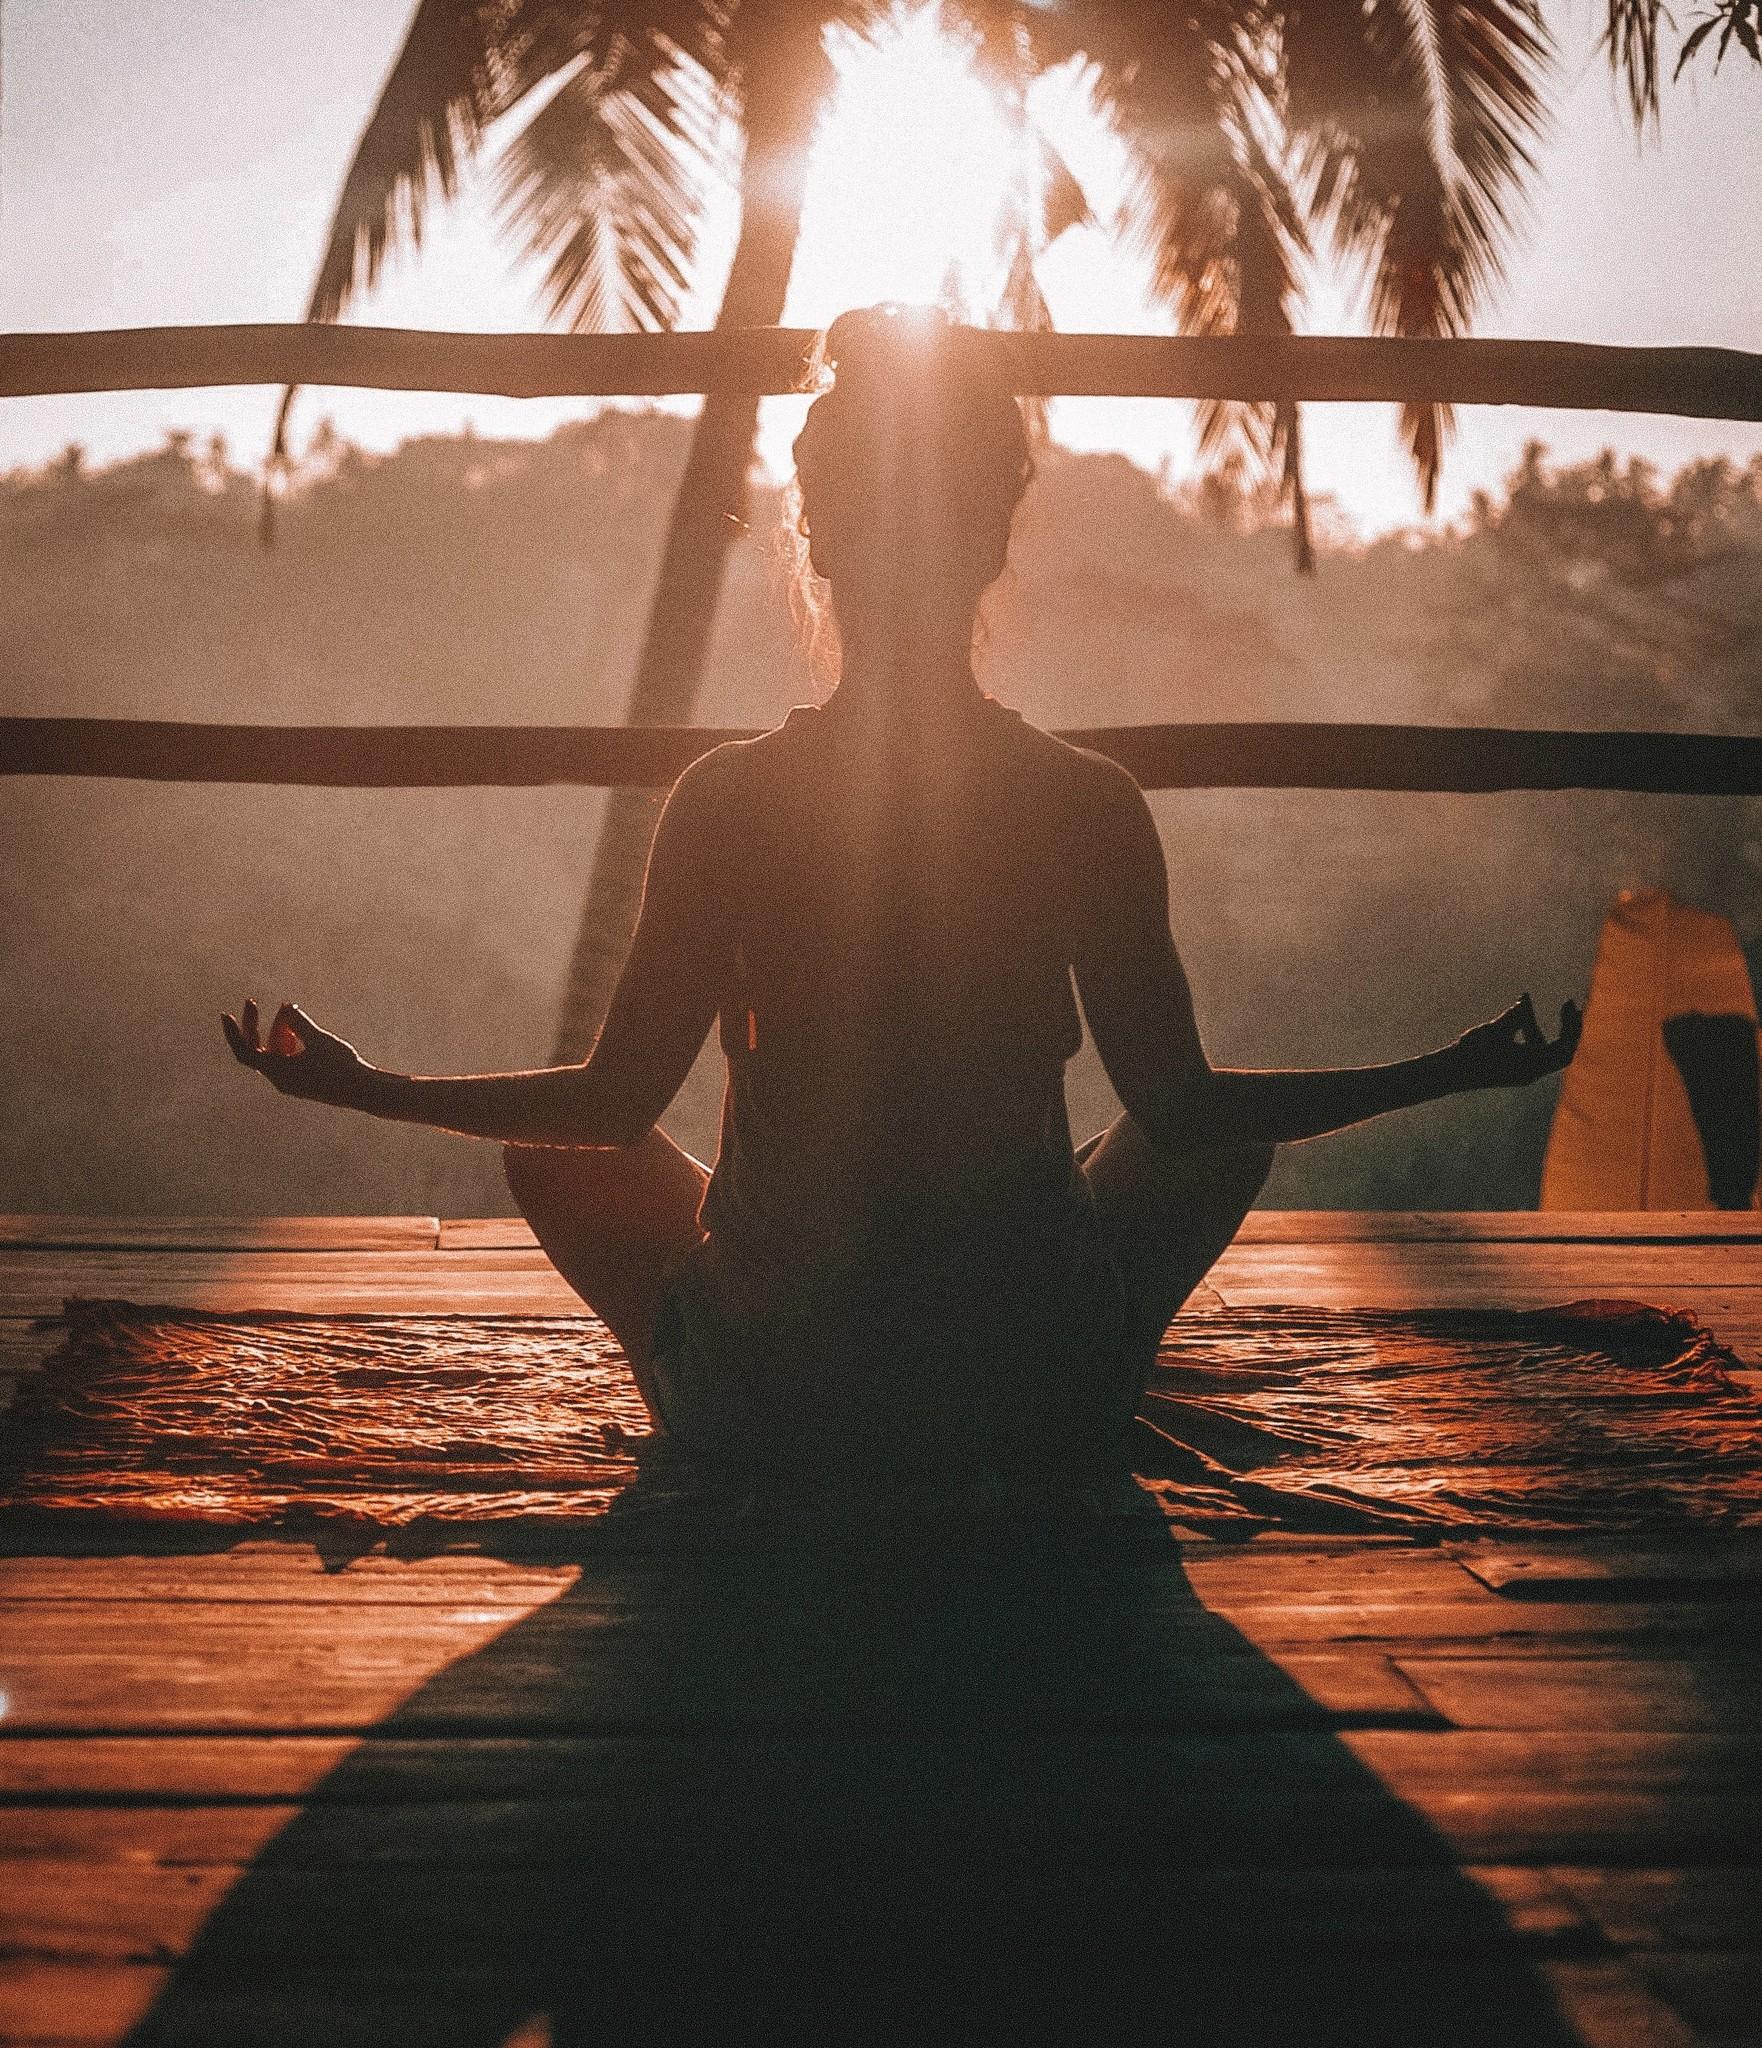 Mediteren is ontspanning